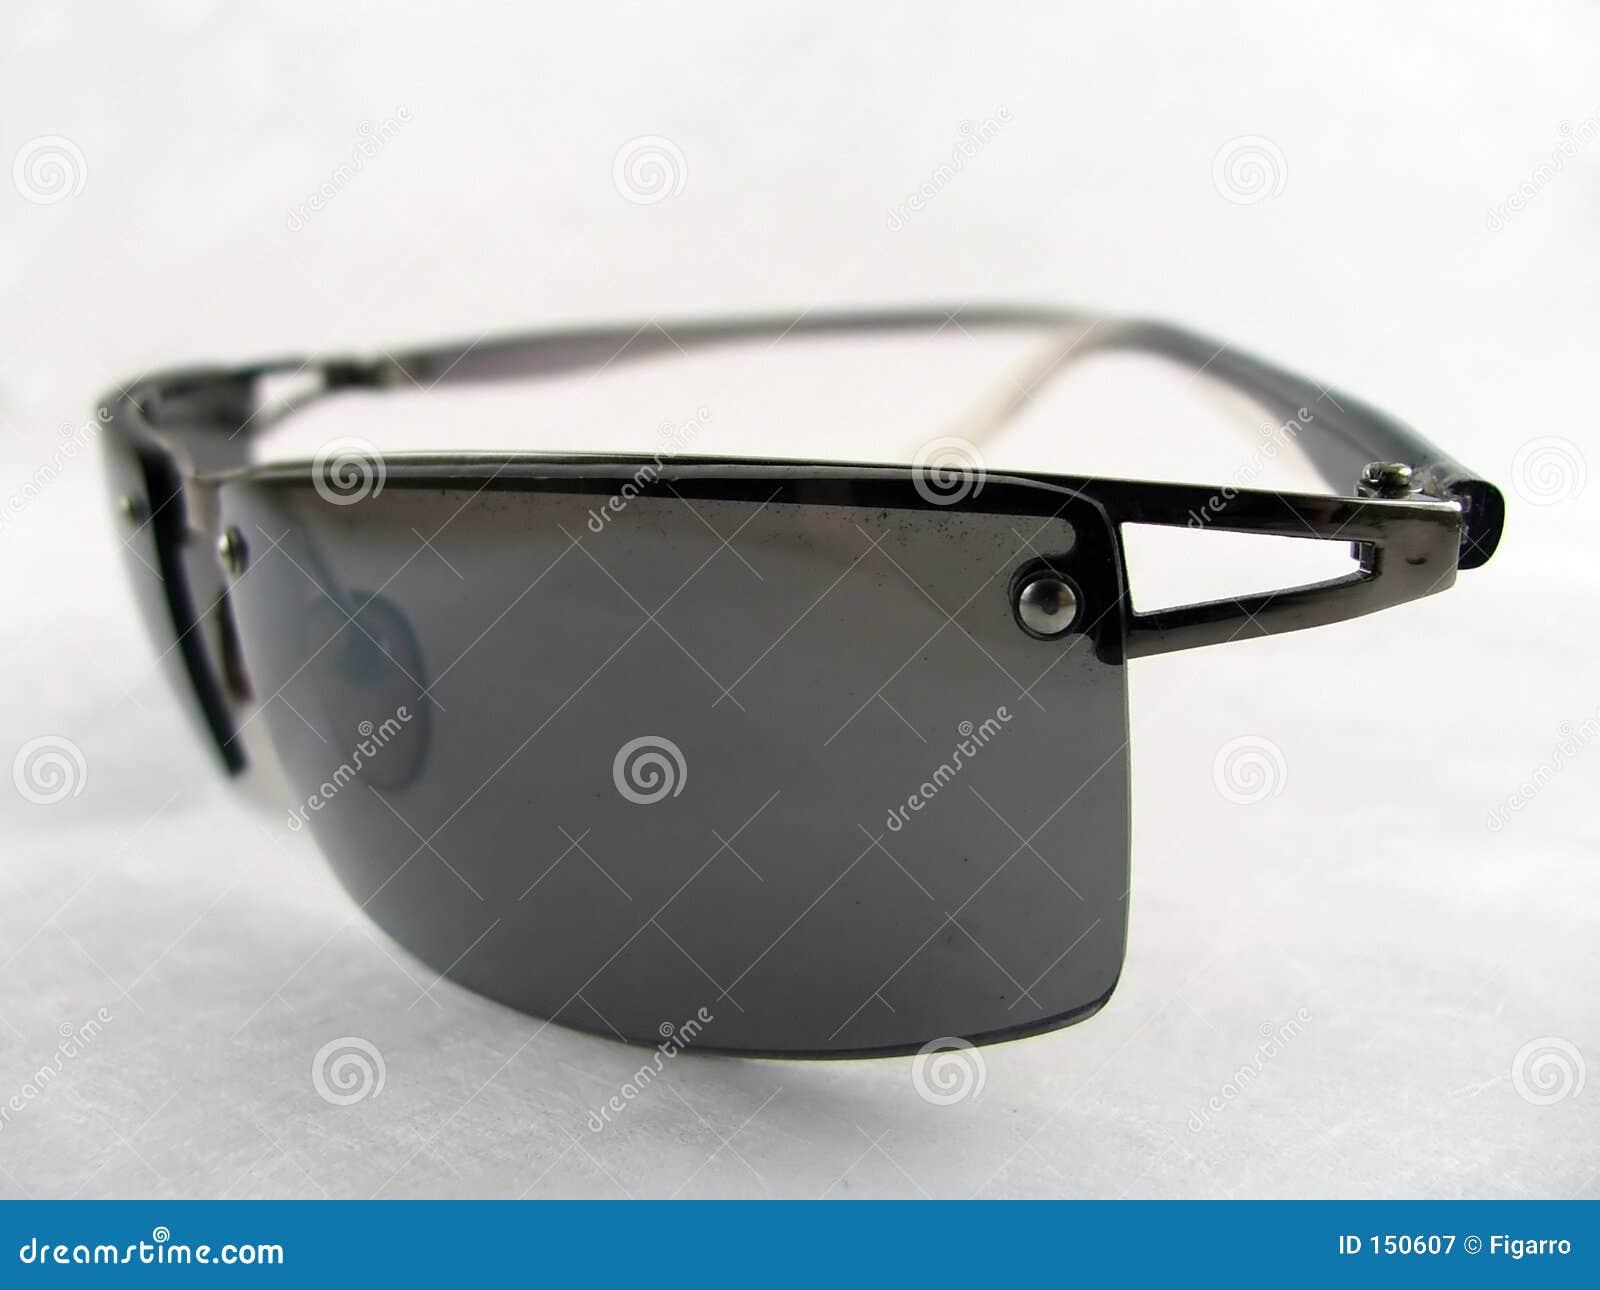 Closer view of sunglasses